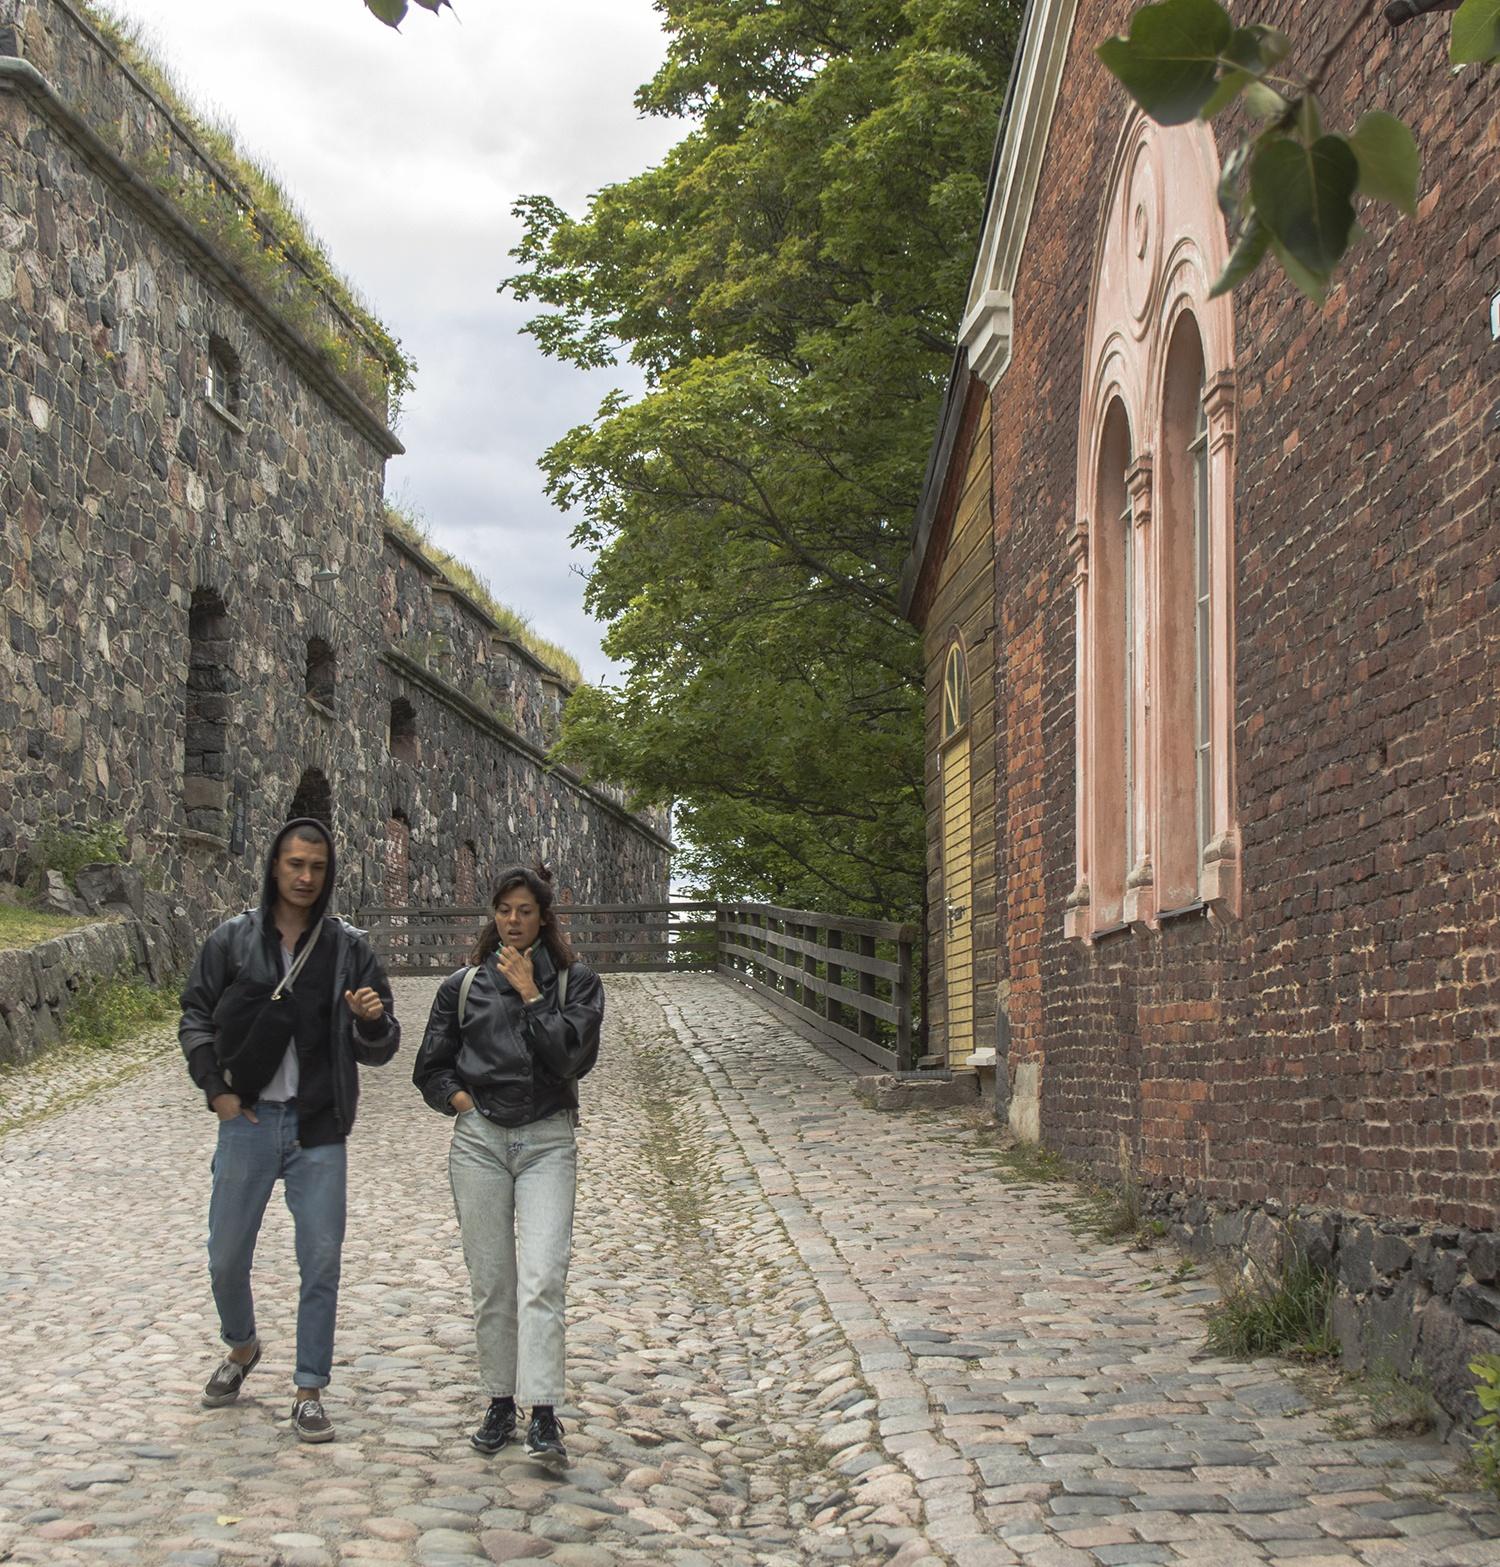 People in Suomenlinna Sea Fortress